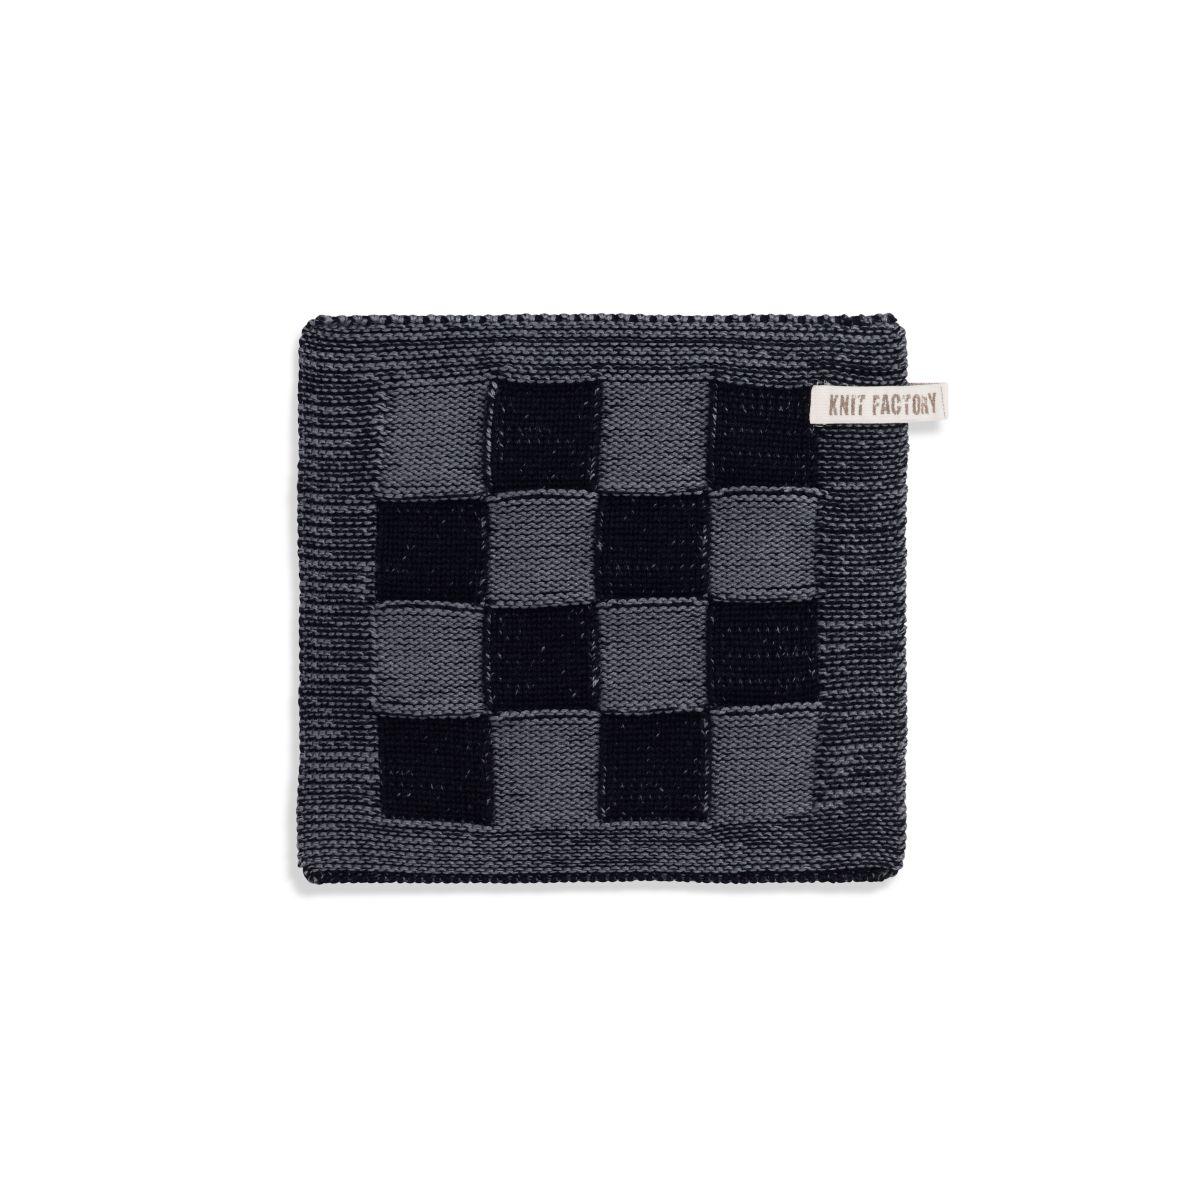 topflappen block schwarzmed grey